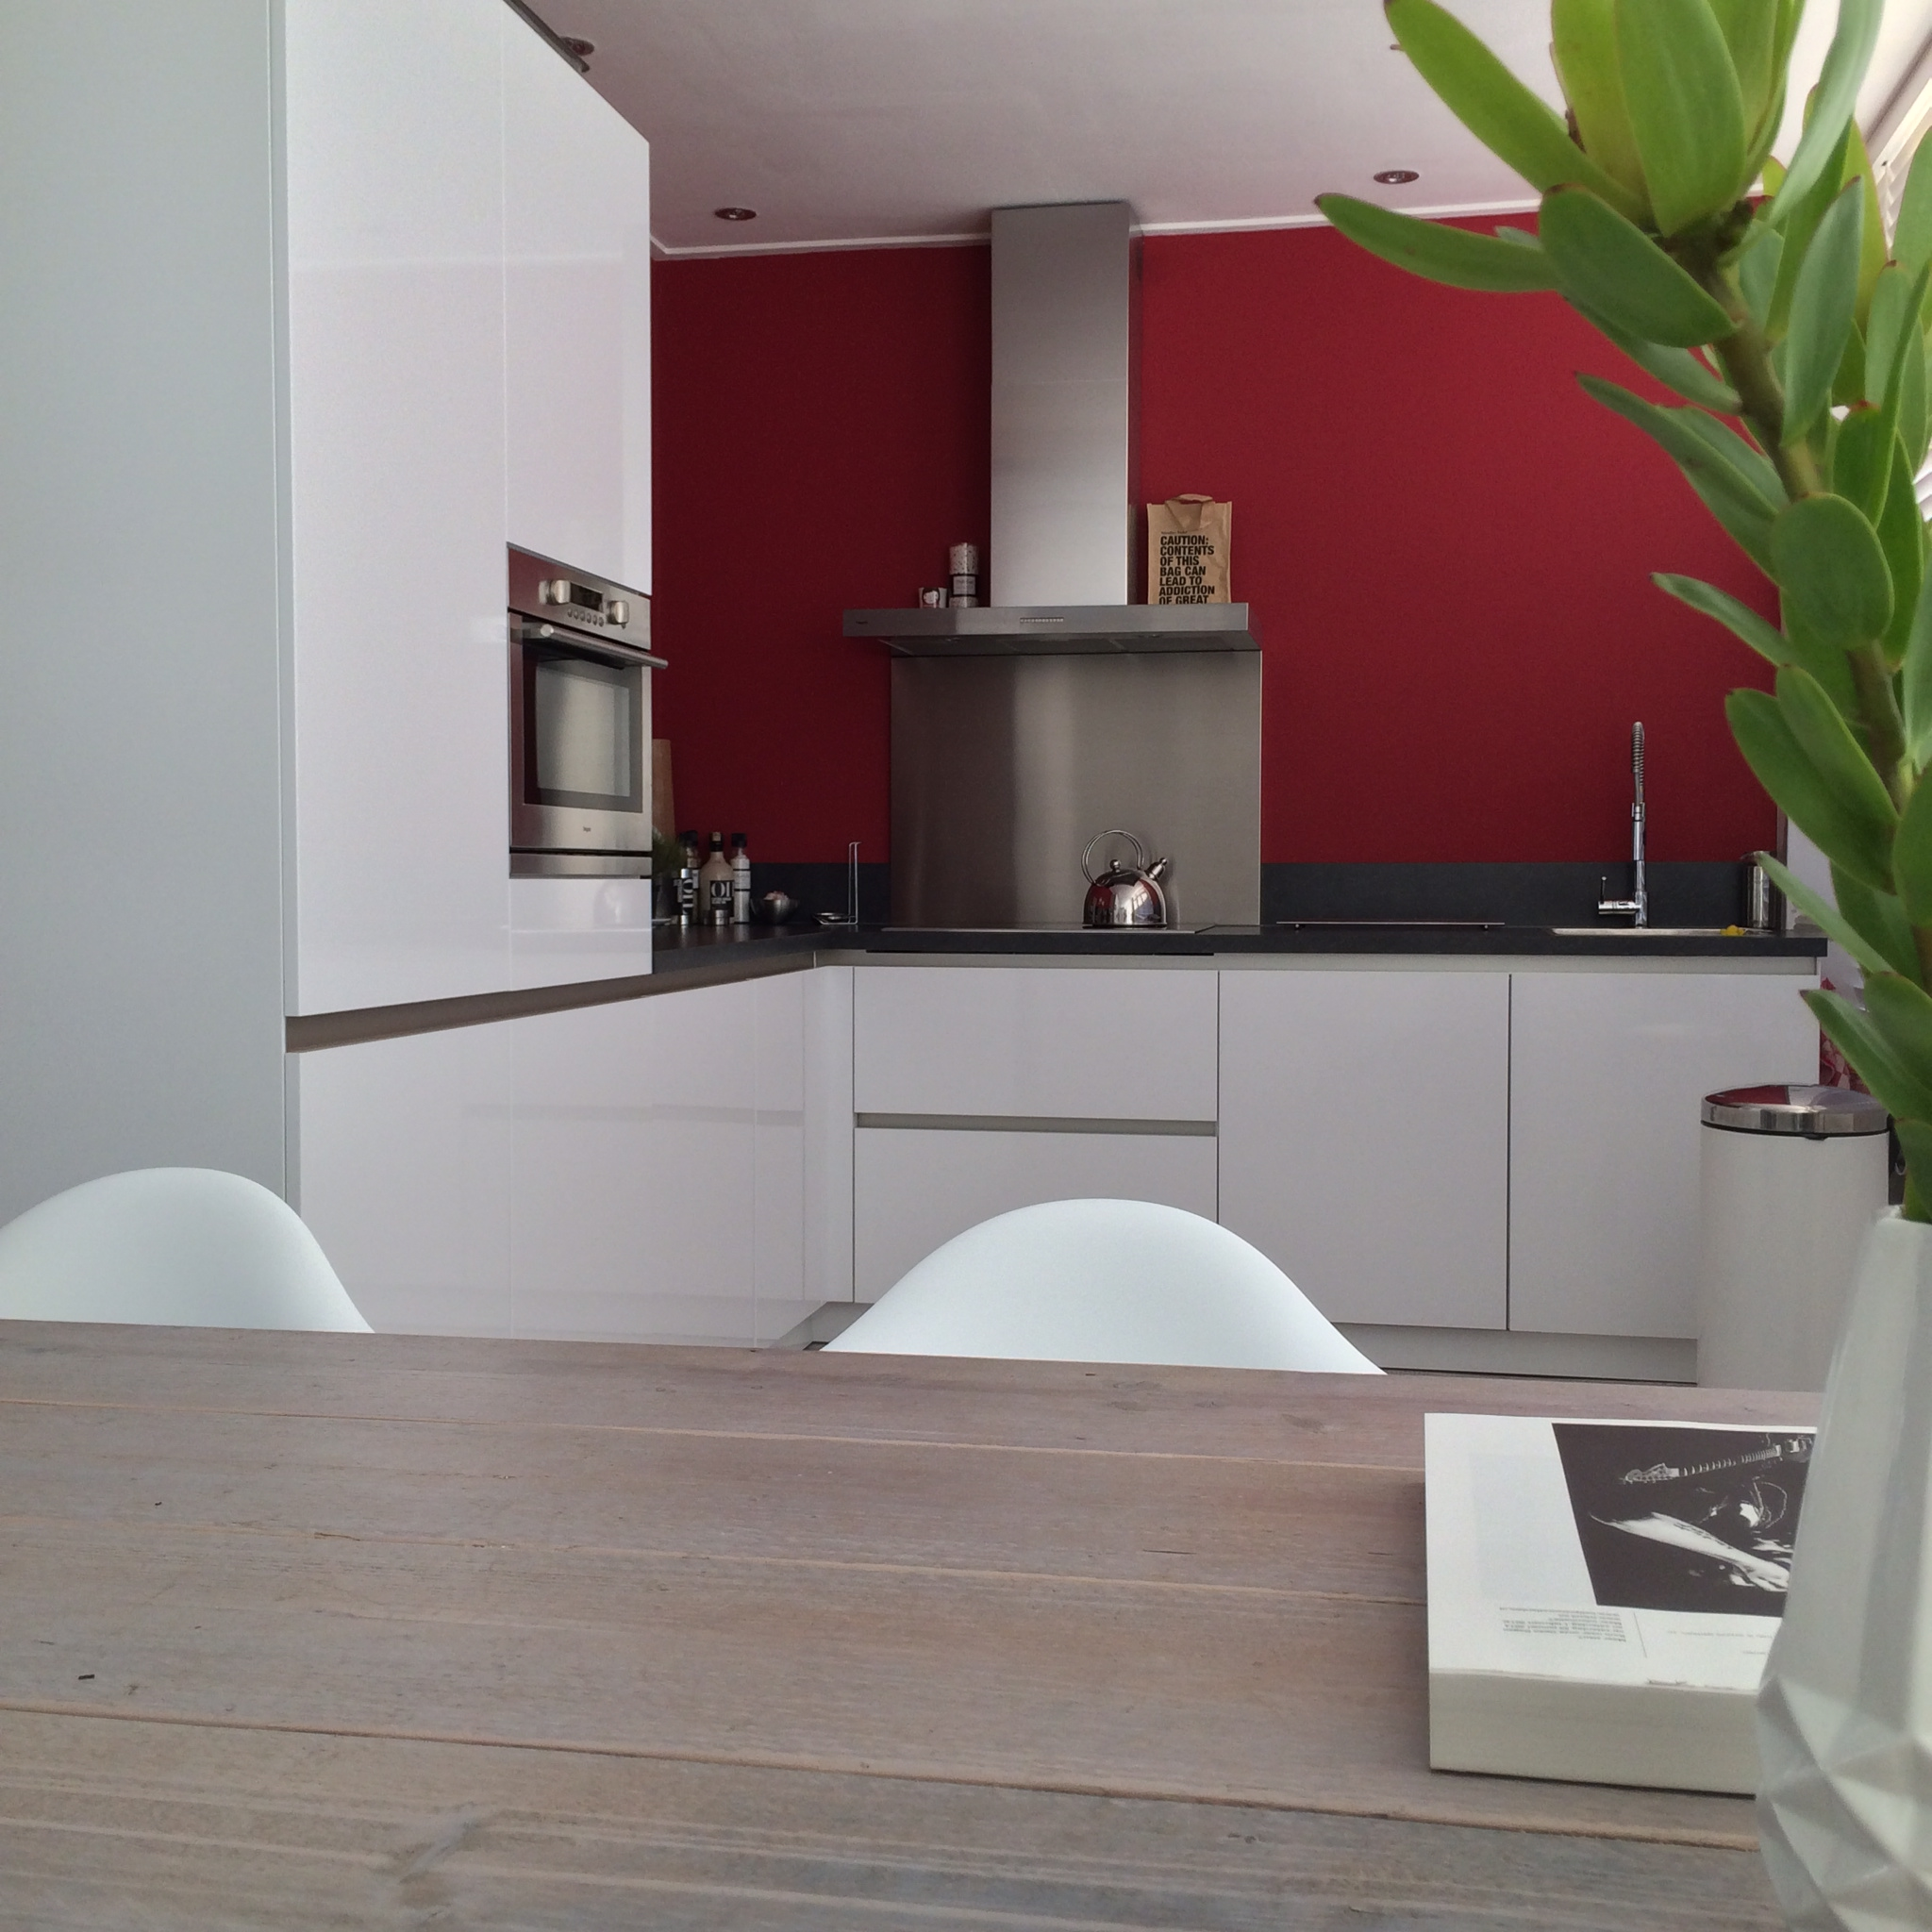 Keuken kleur muur - Kleur witte keuken ...